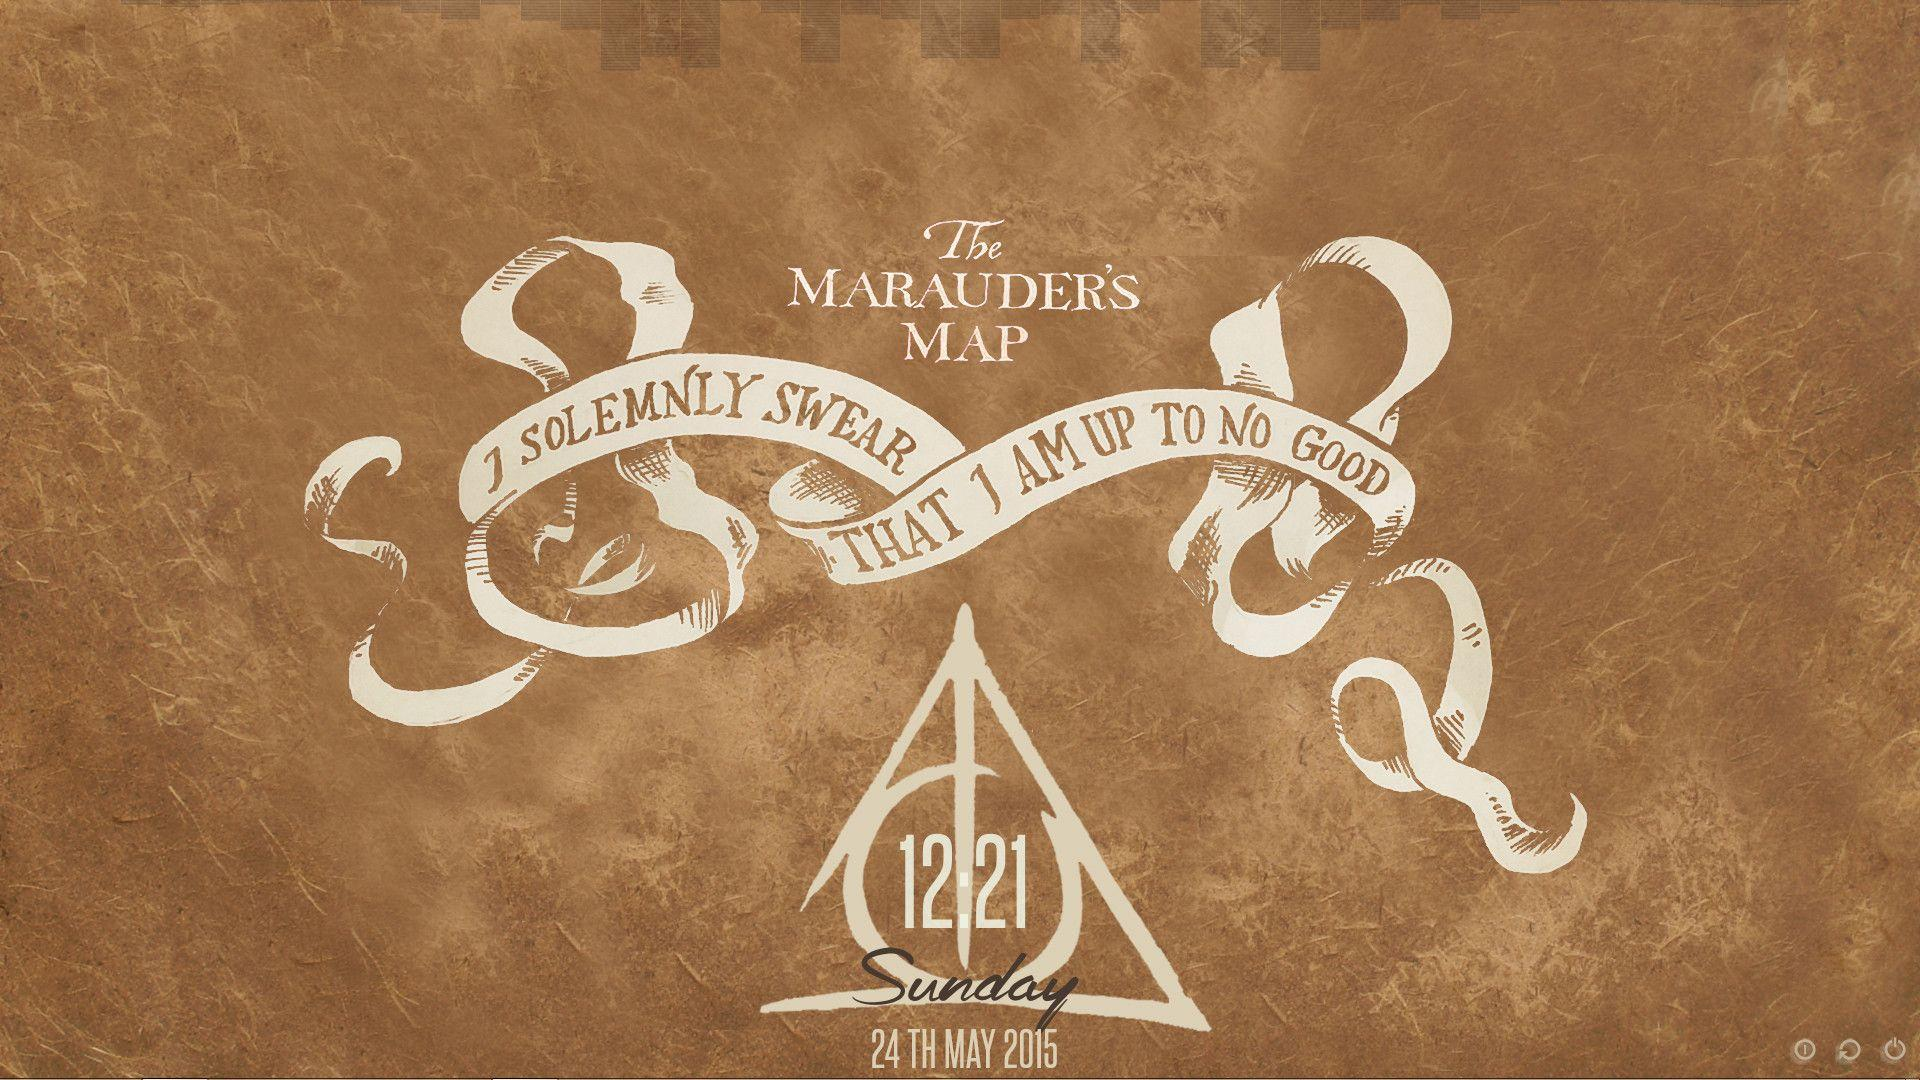 Marauders Wallpapers Wallpaper Cave